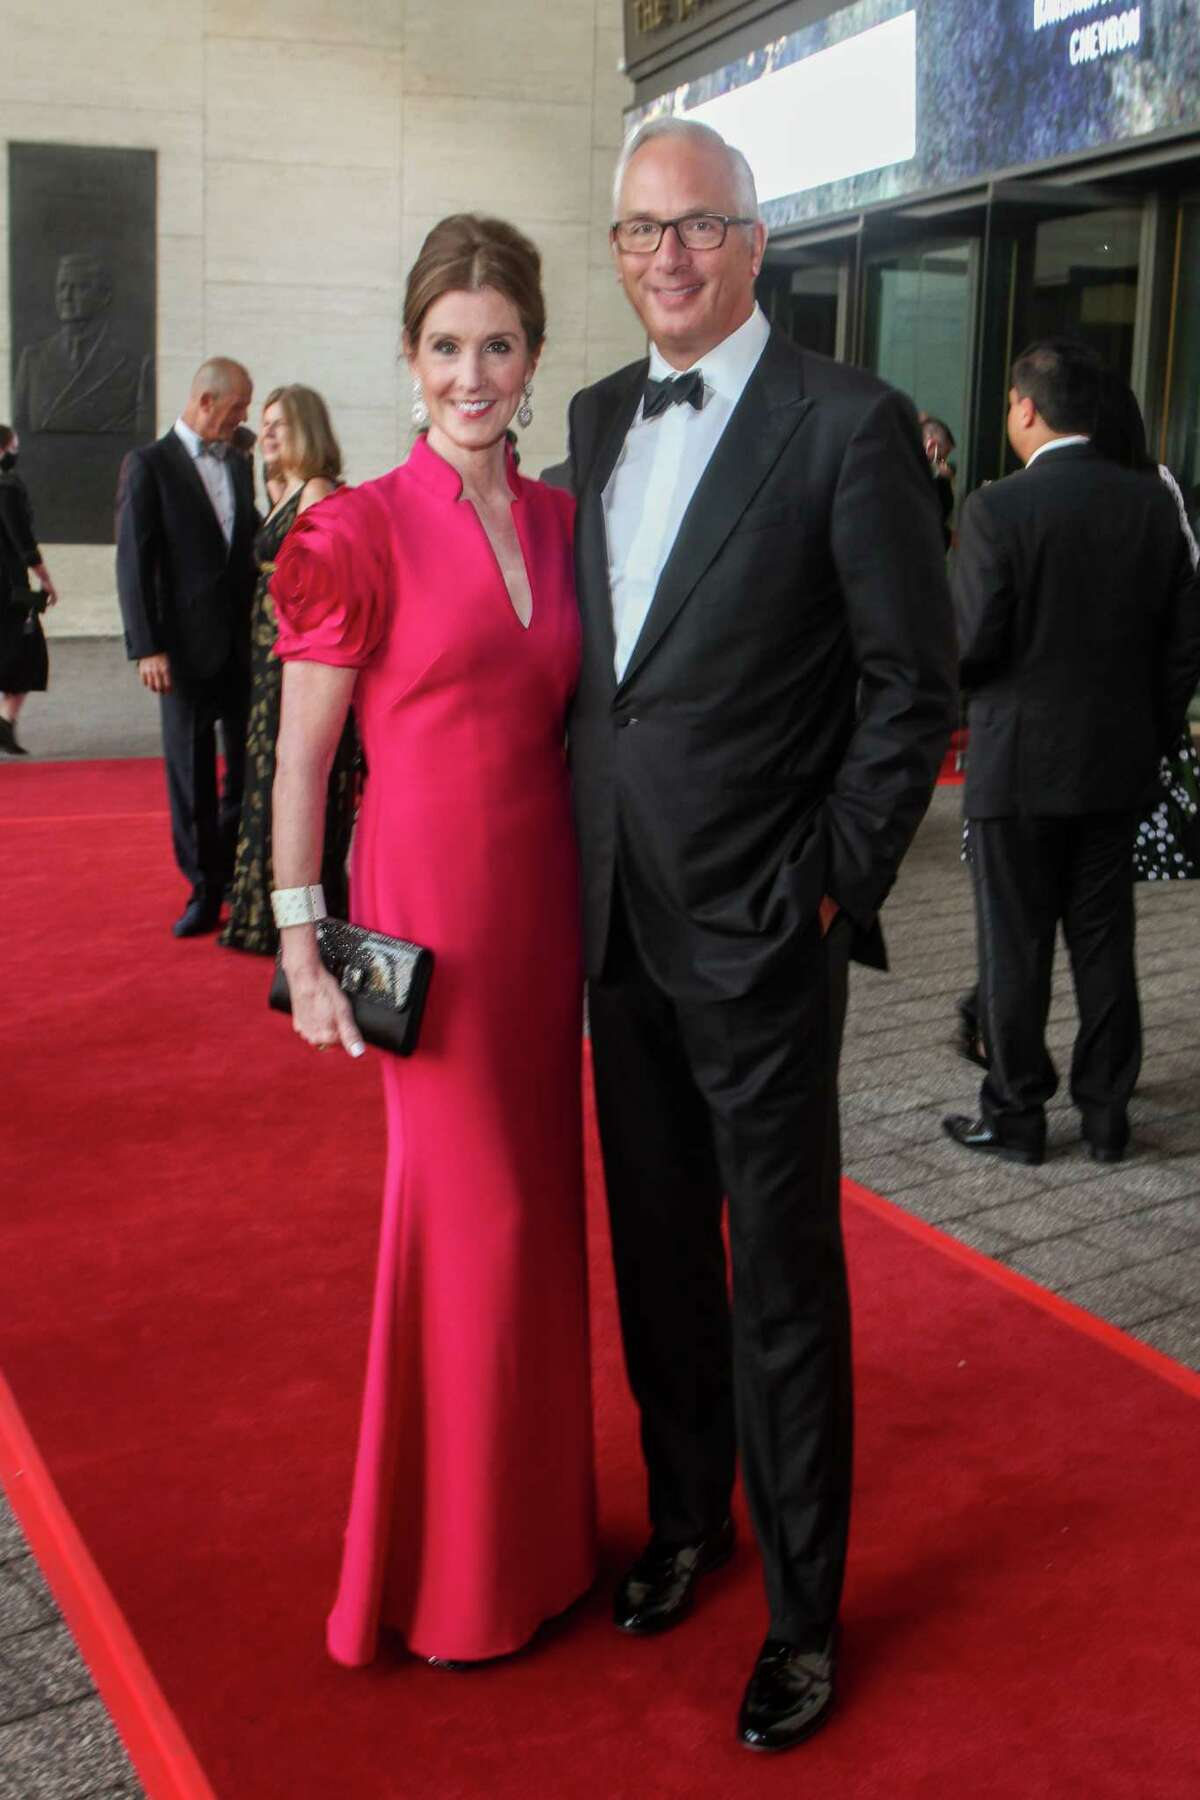 Phoebe and Bobby Tudor at the Houston Symphony Opening Night Concert.